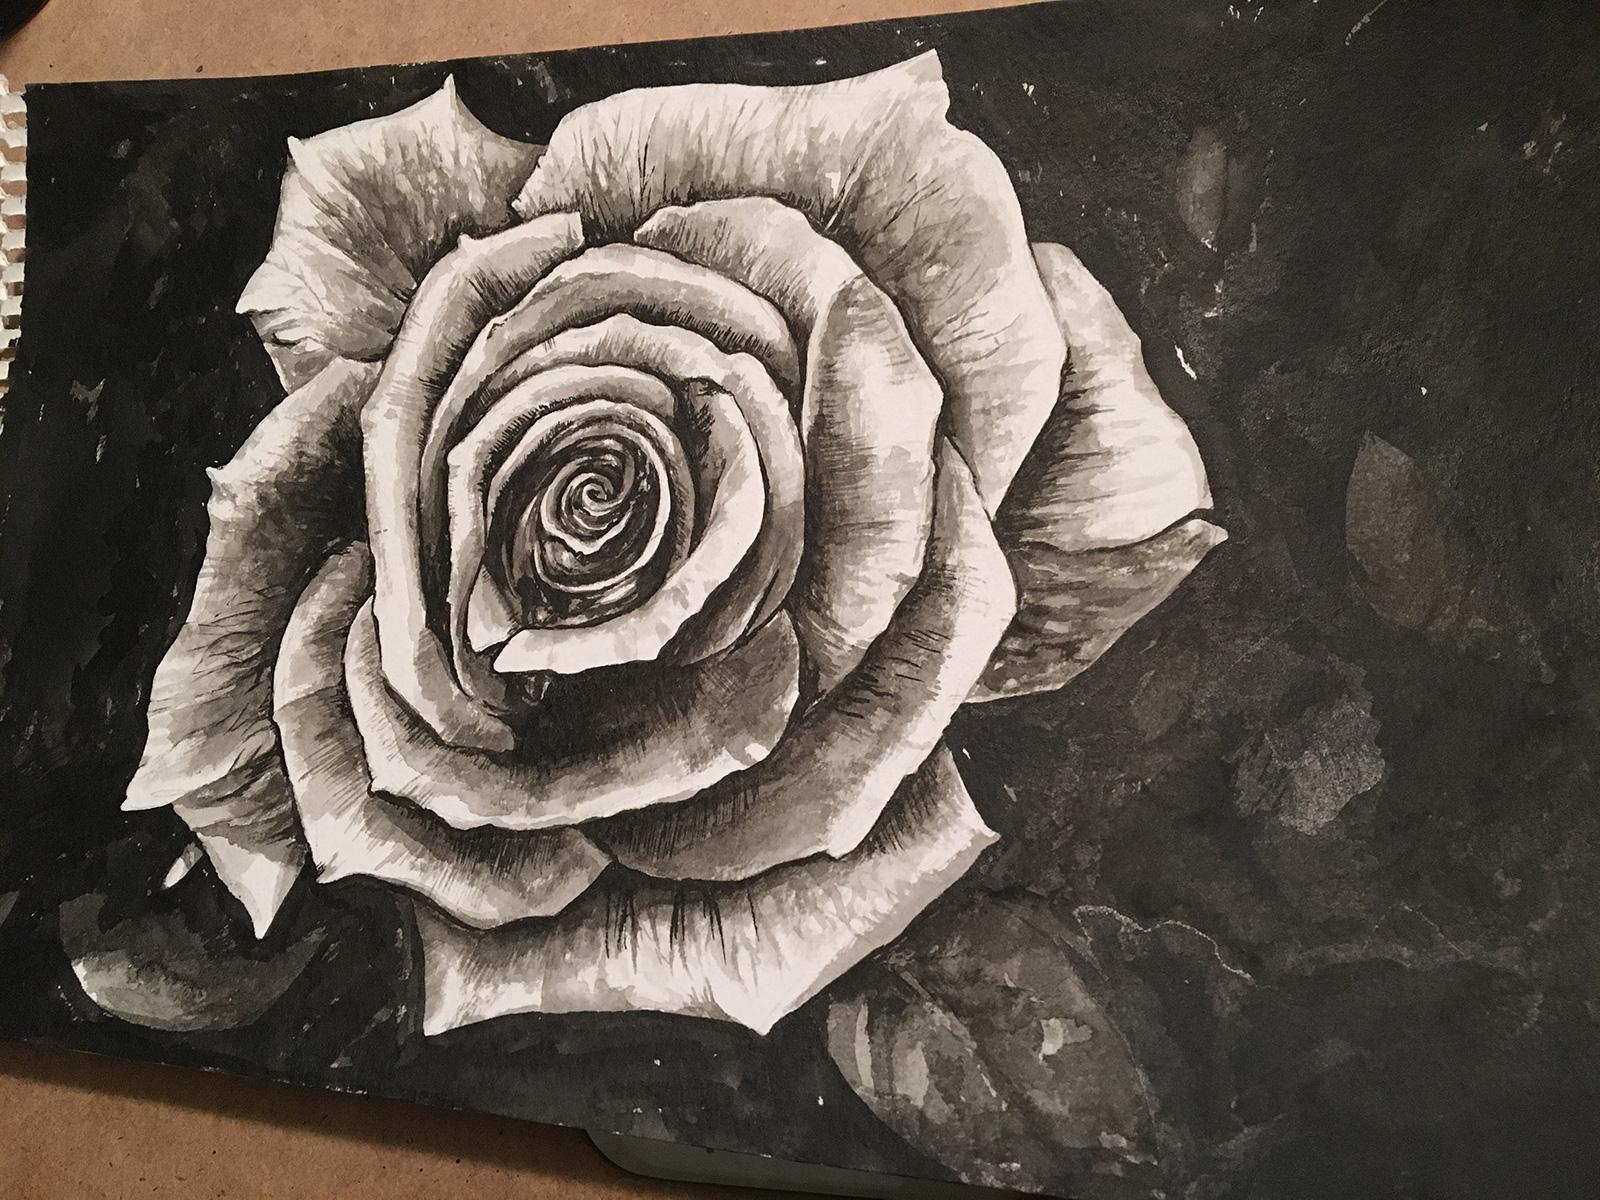 jordan-fretz-design-ink-wash-painting-rose-smaller.jpg